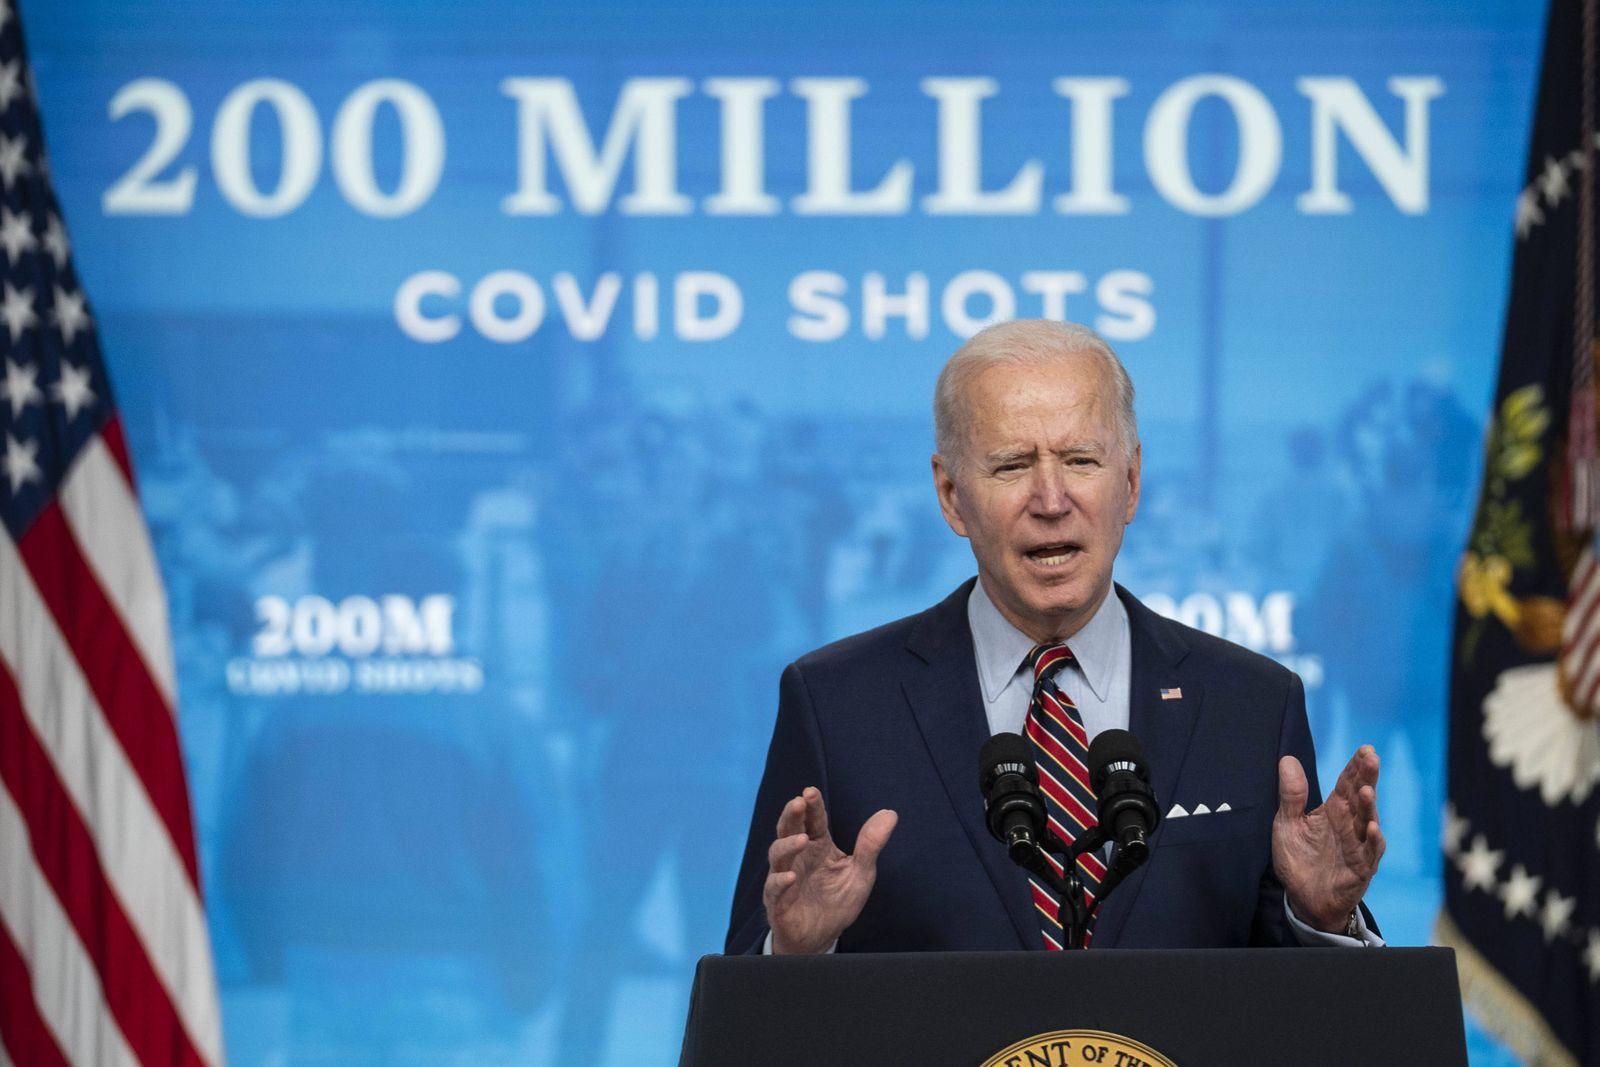 U.S. President Joe Biden speaks in the Eisenhower Executive Office Building in Washington, D.C., U.S., on Wednesday, Apr